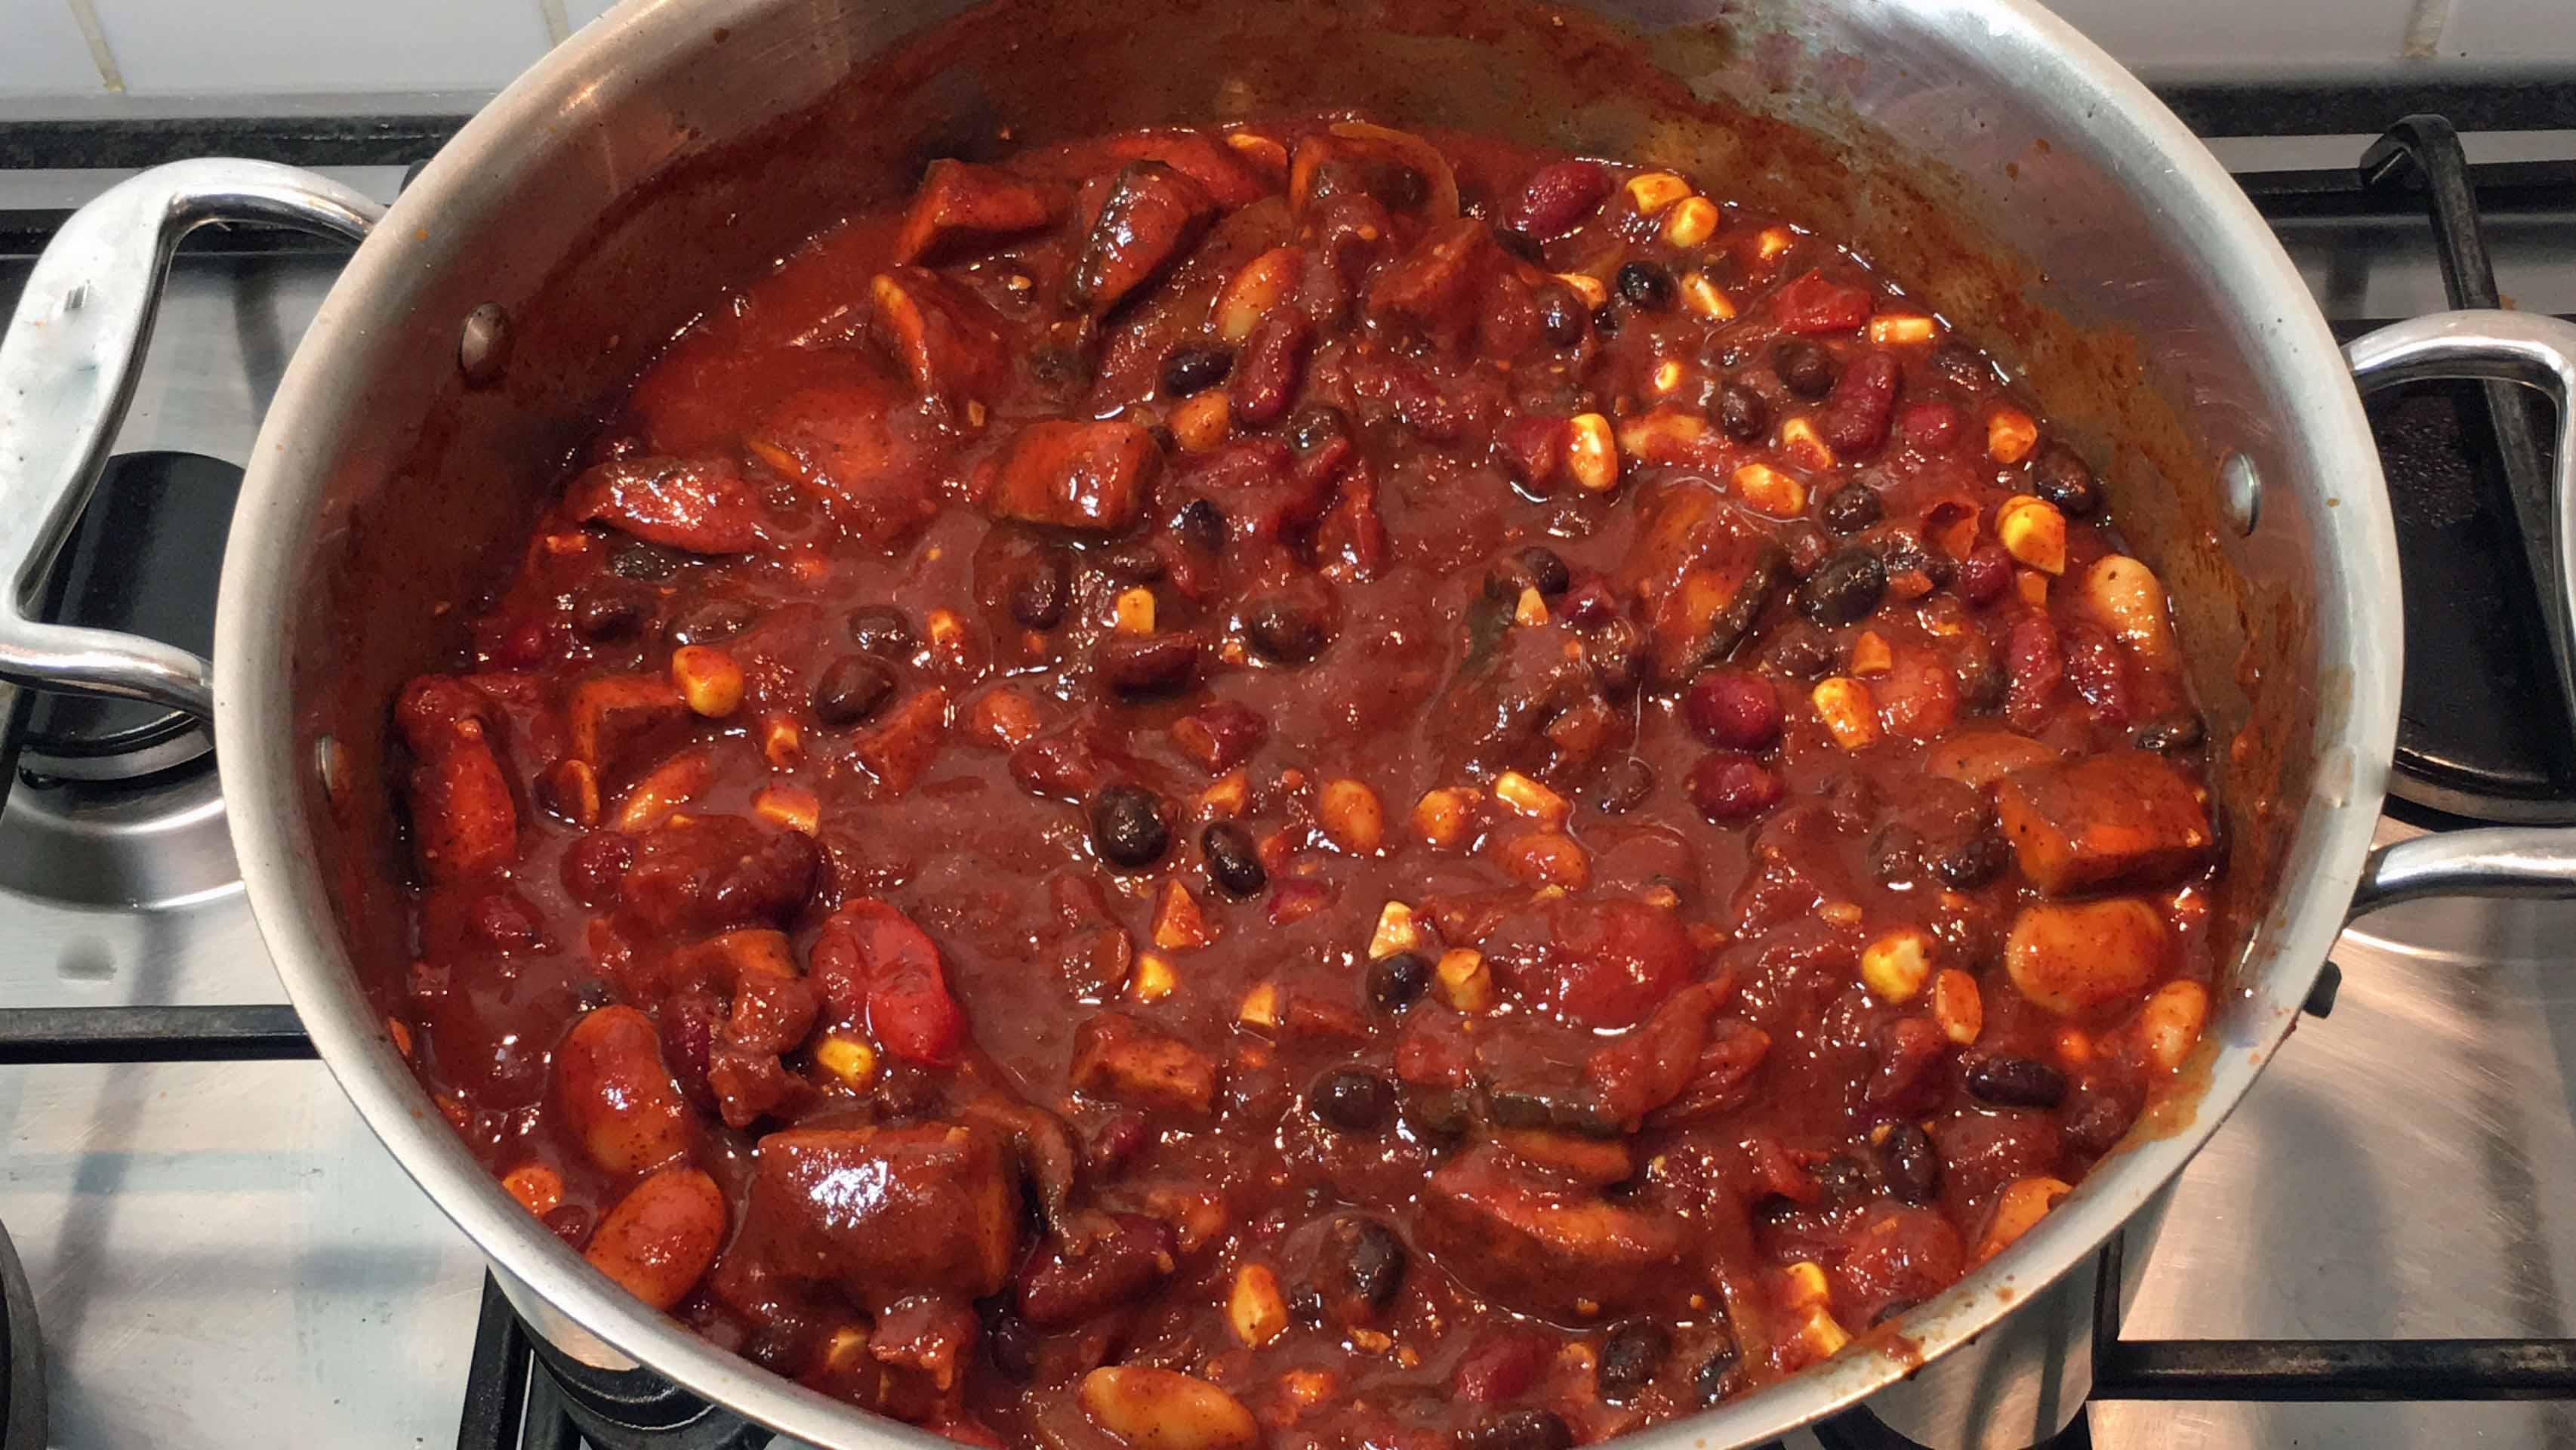 How To Make Vegetarian Chili